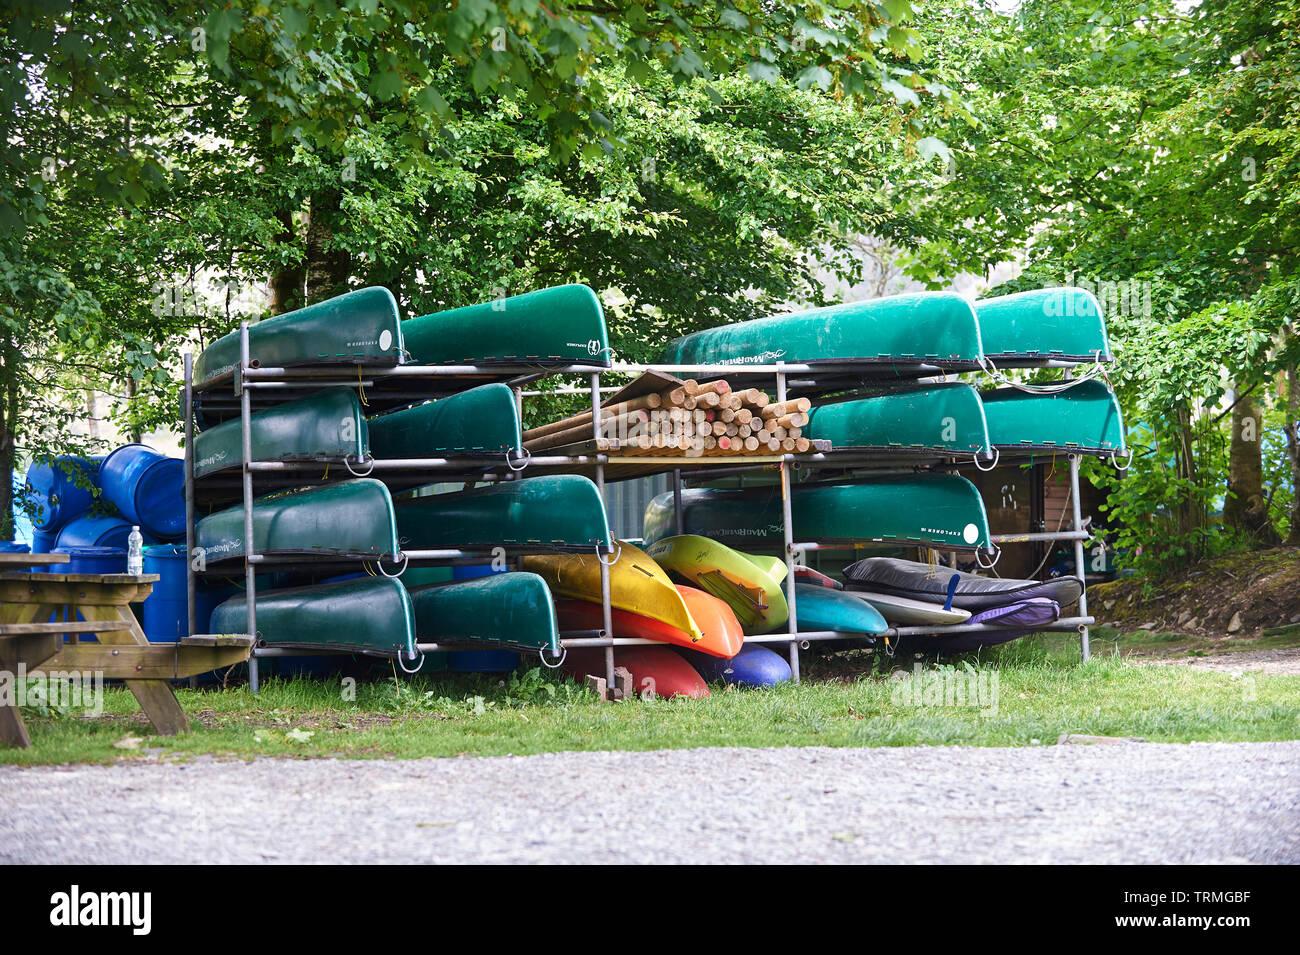 Canoe Rack Stock Photos & Canoe Rack Stock Images - Alamy